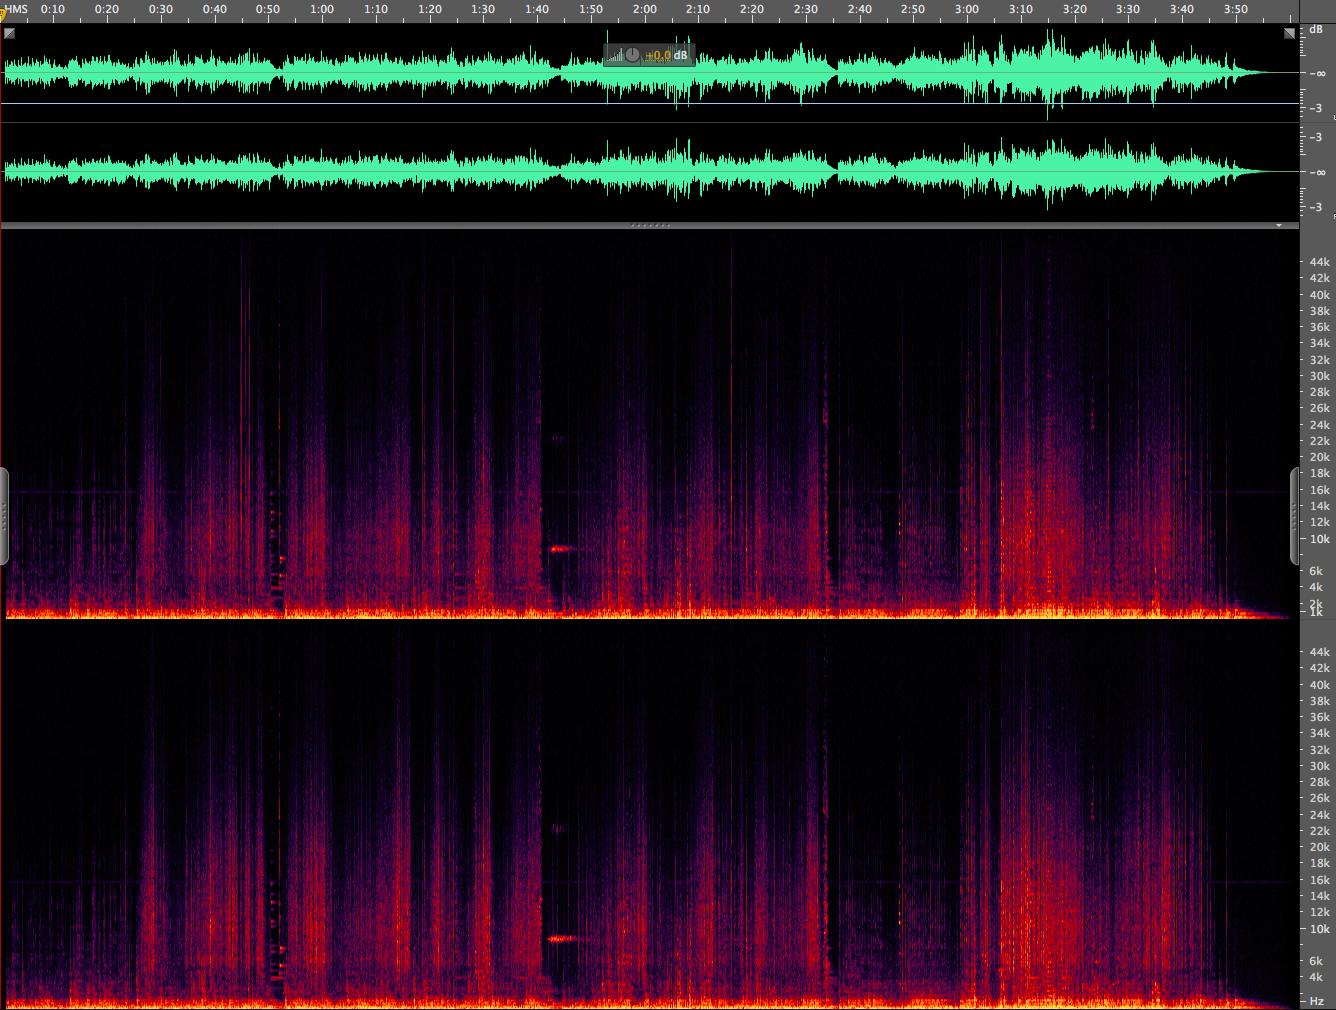 1-Laurence Juber - Guitar Noir -Mosaic_Spectragraph